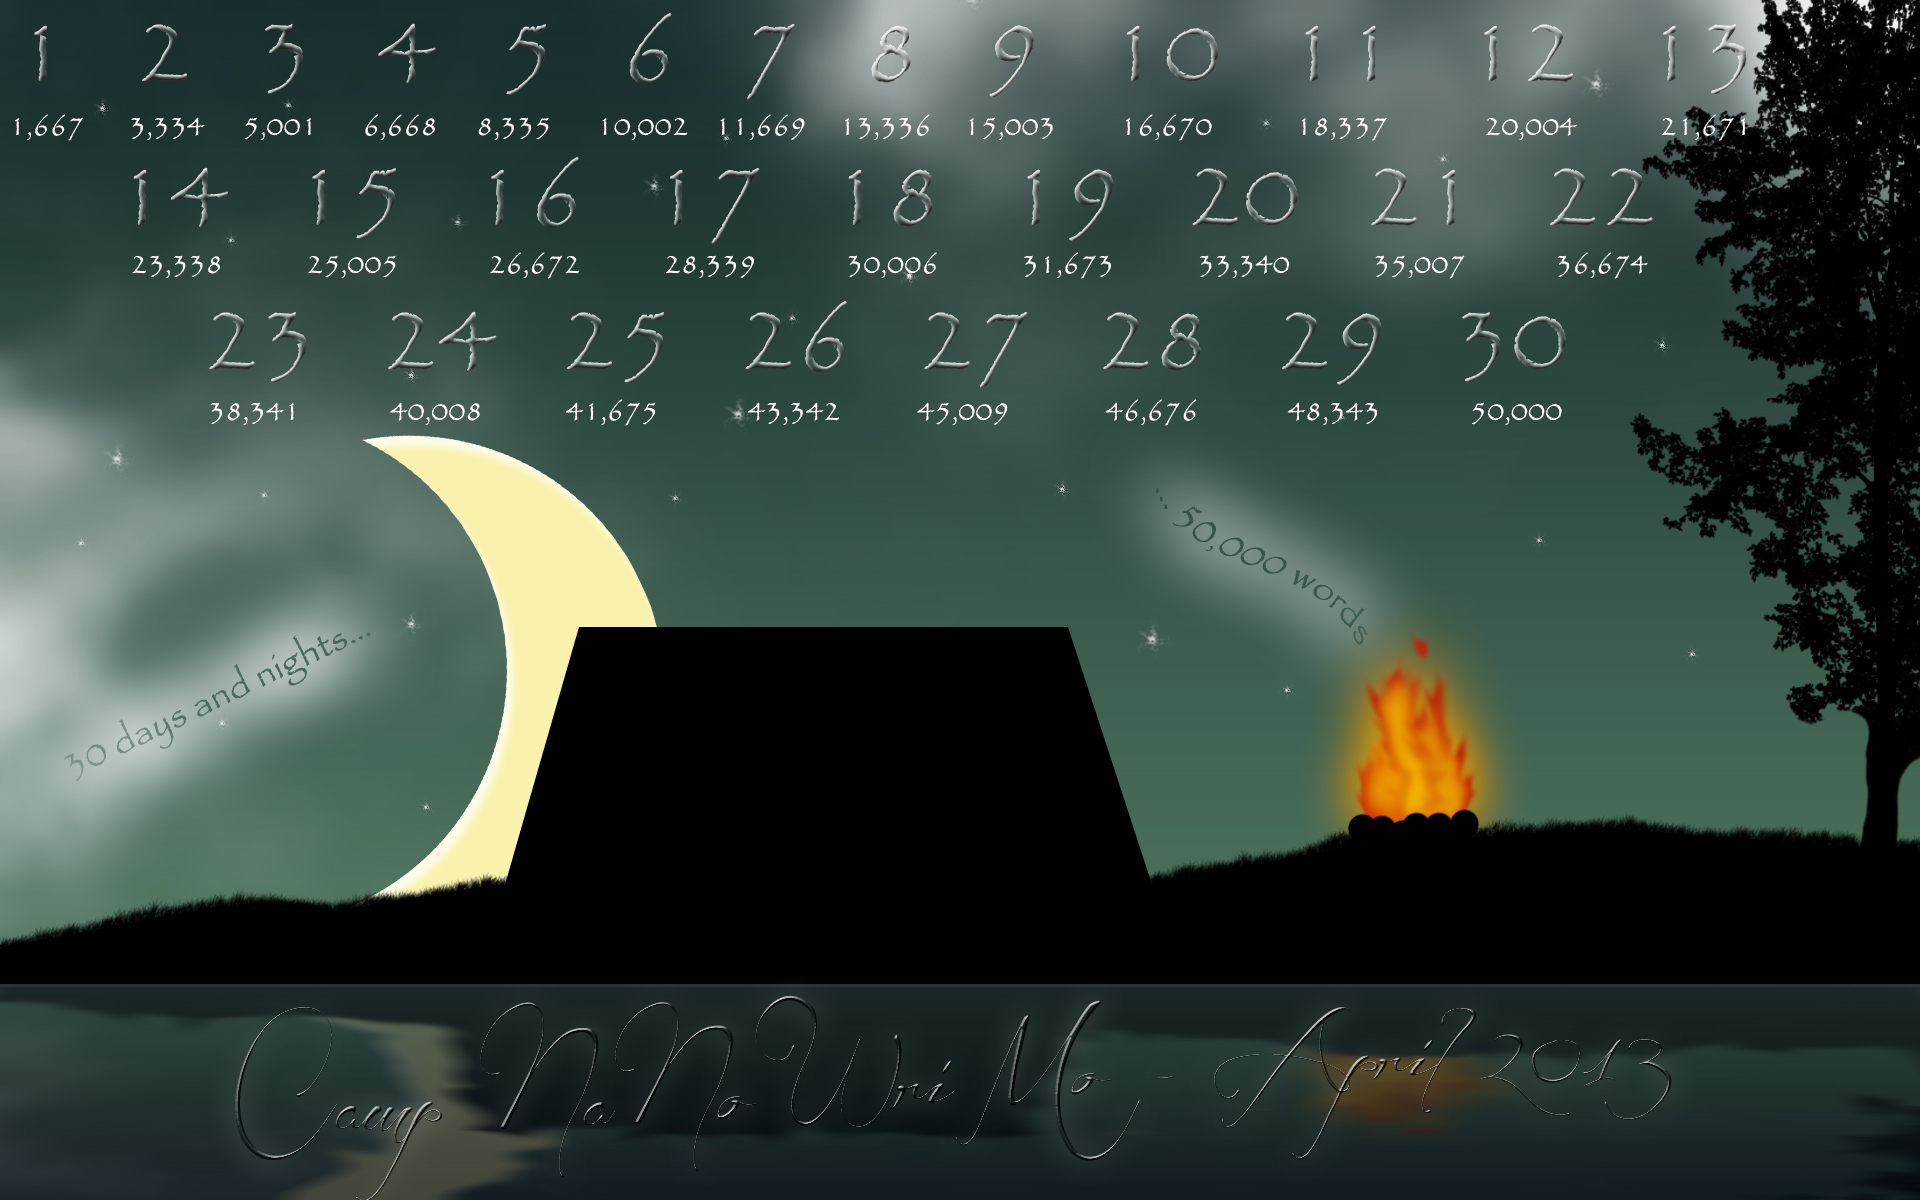 2011 Nanowrimo Calendar Wallpaper - surlymuse